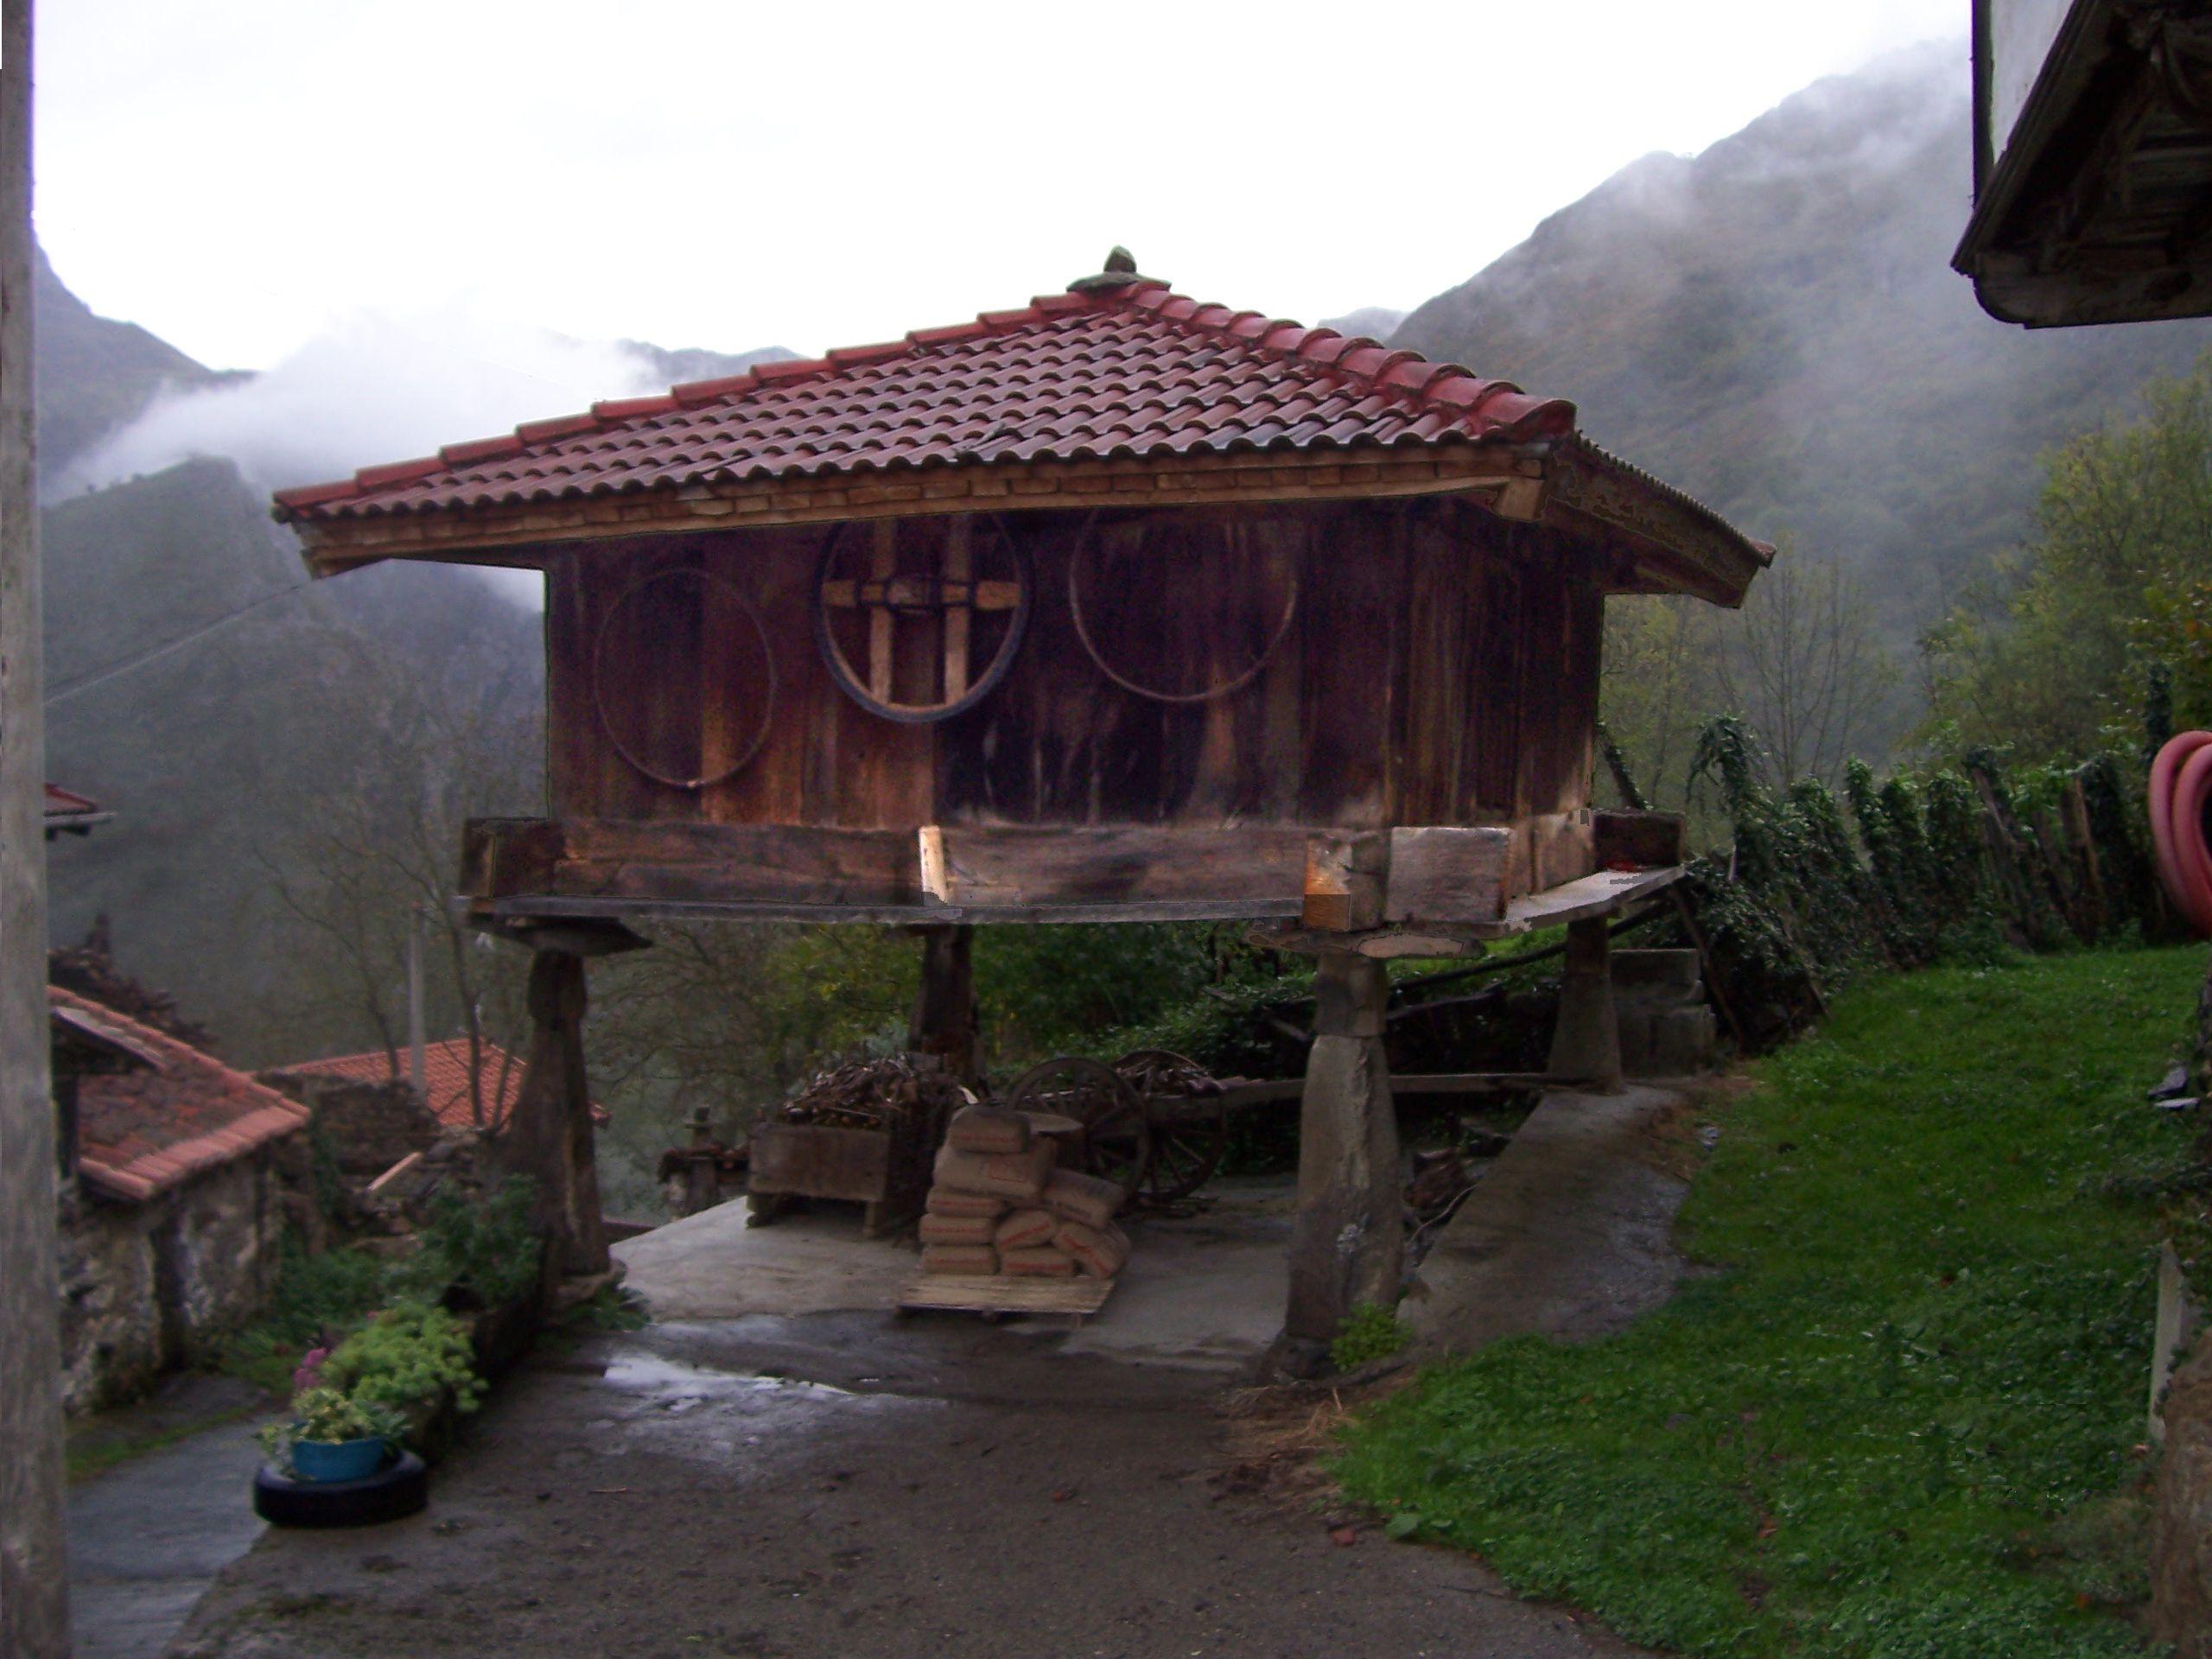 El h rreo asturiano espa a pinterest horreo asturias espa a y asturiano - Casas rurales cerca de oviedo ...